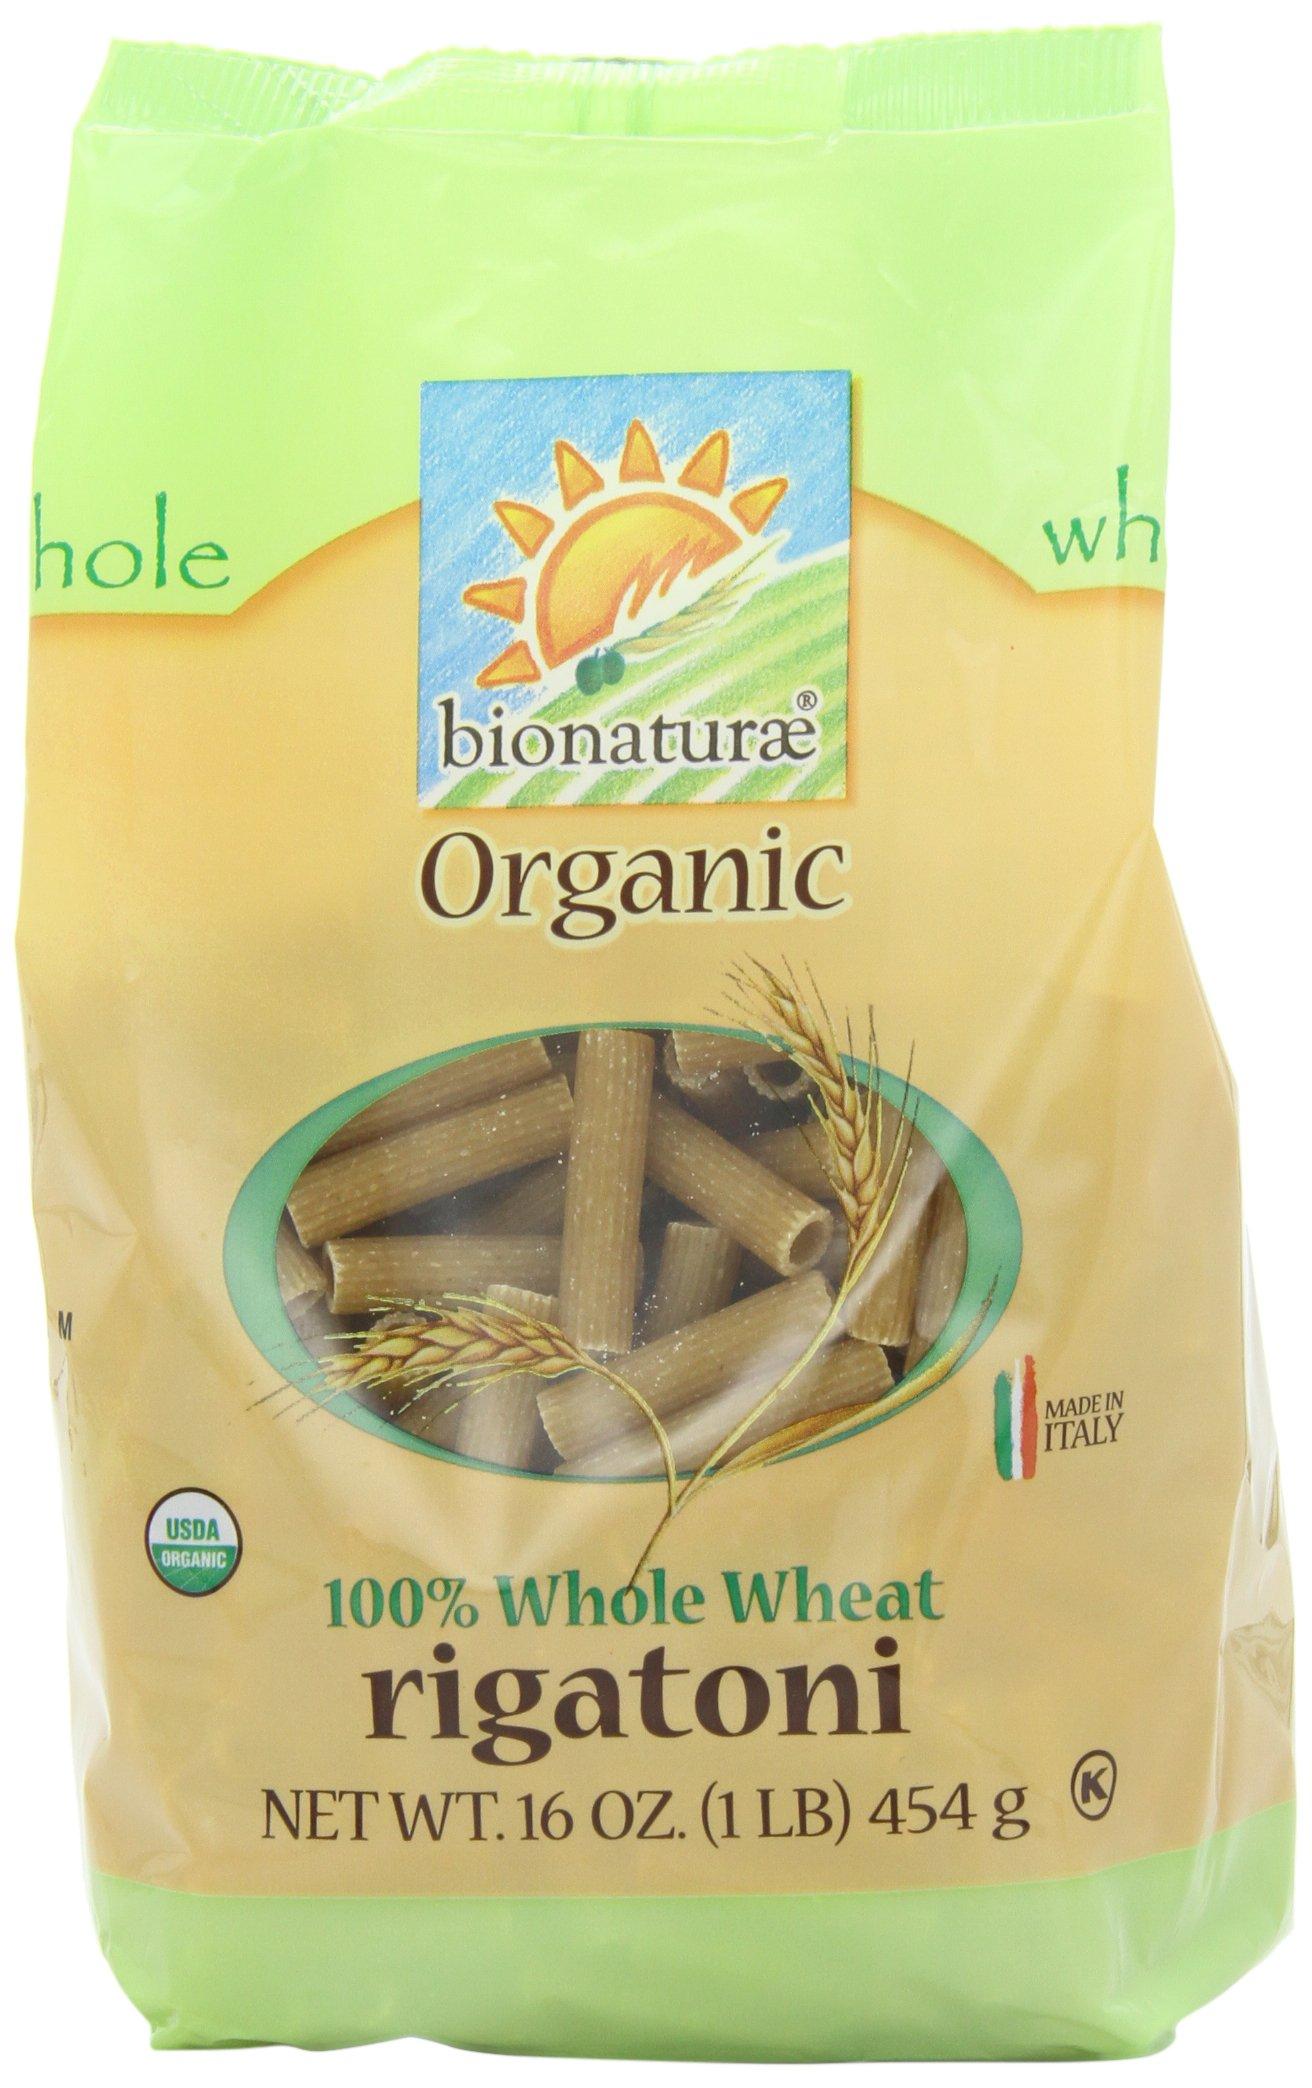 bionaturae Organic Whole Wheat Rigatoni, 16-Ounce Bag (Pack of 6)